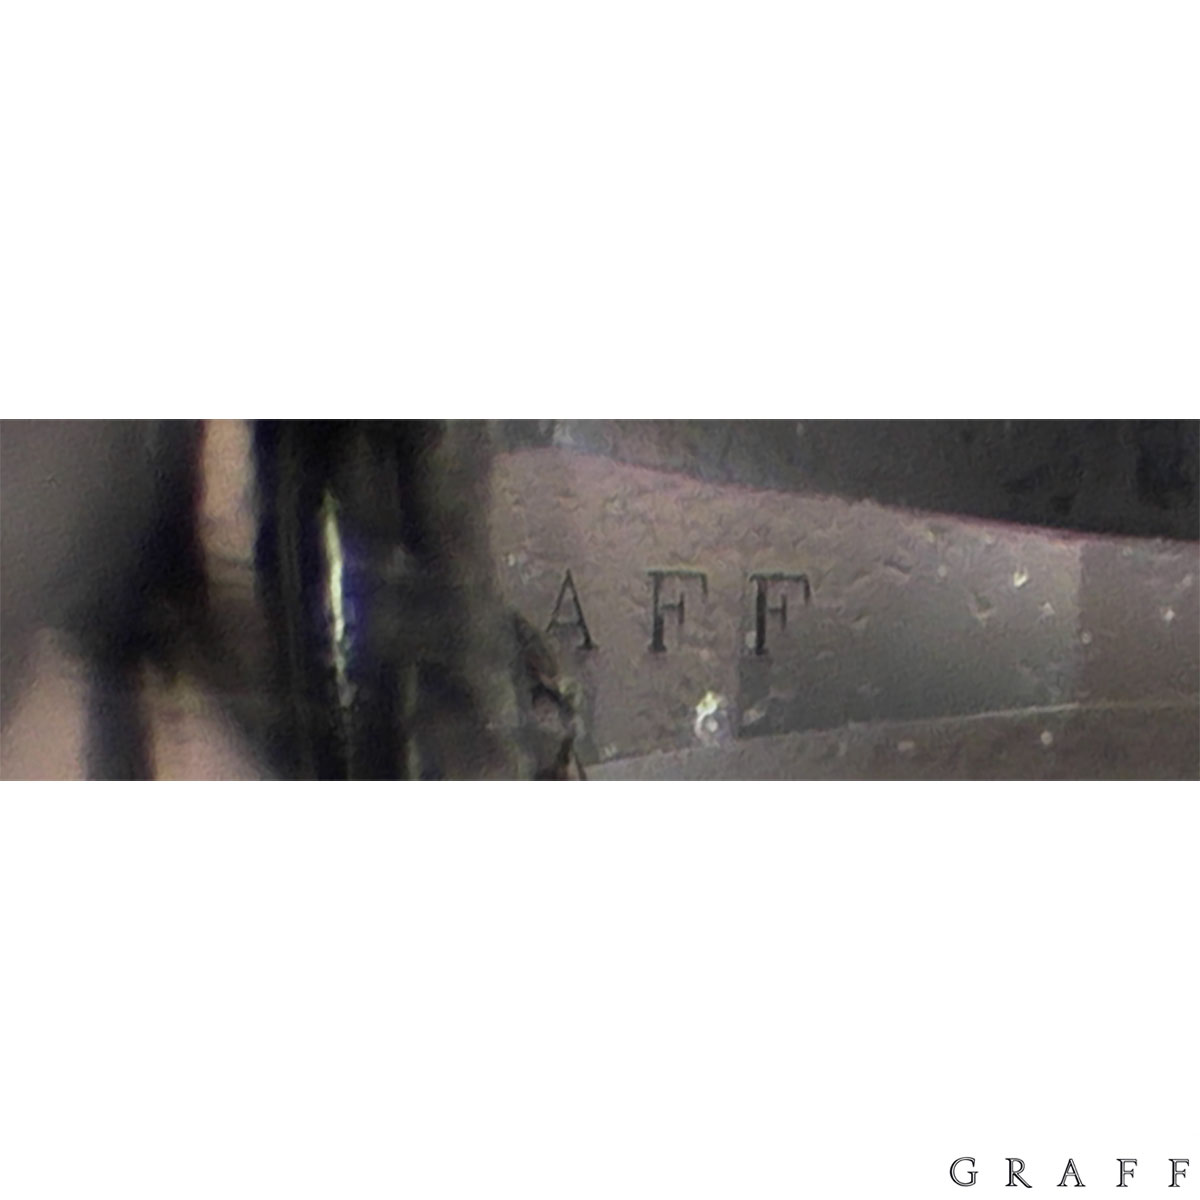 Graff Stud Earrings 4.28ct H/VS1 & VS2